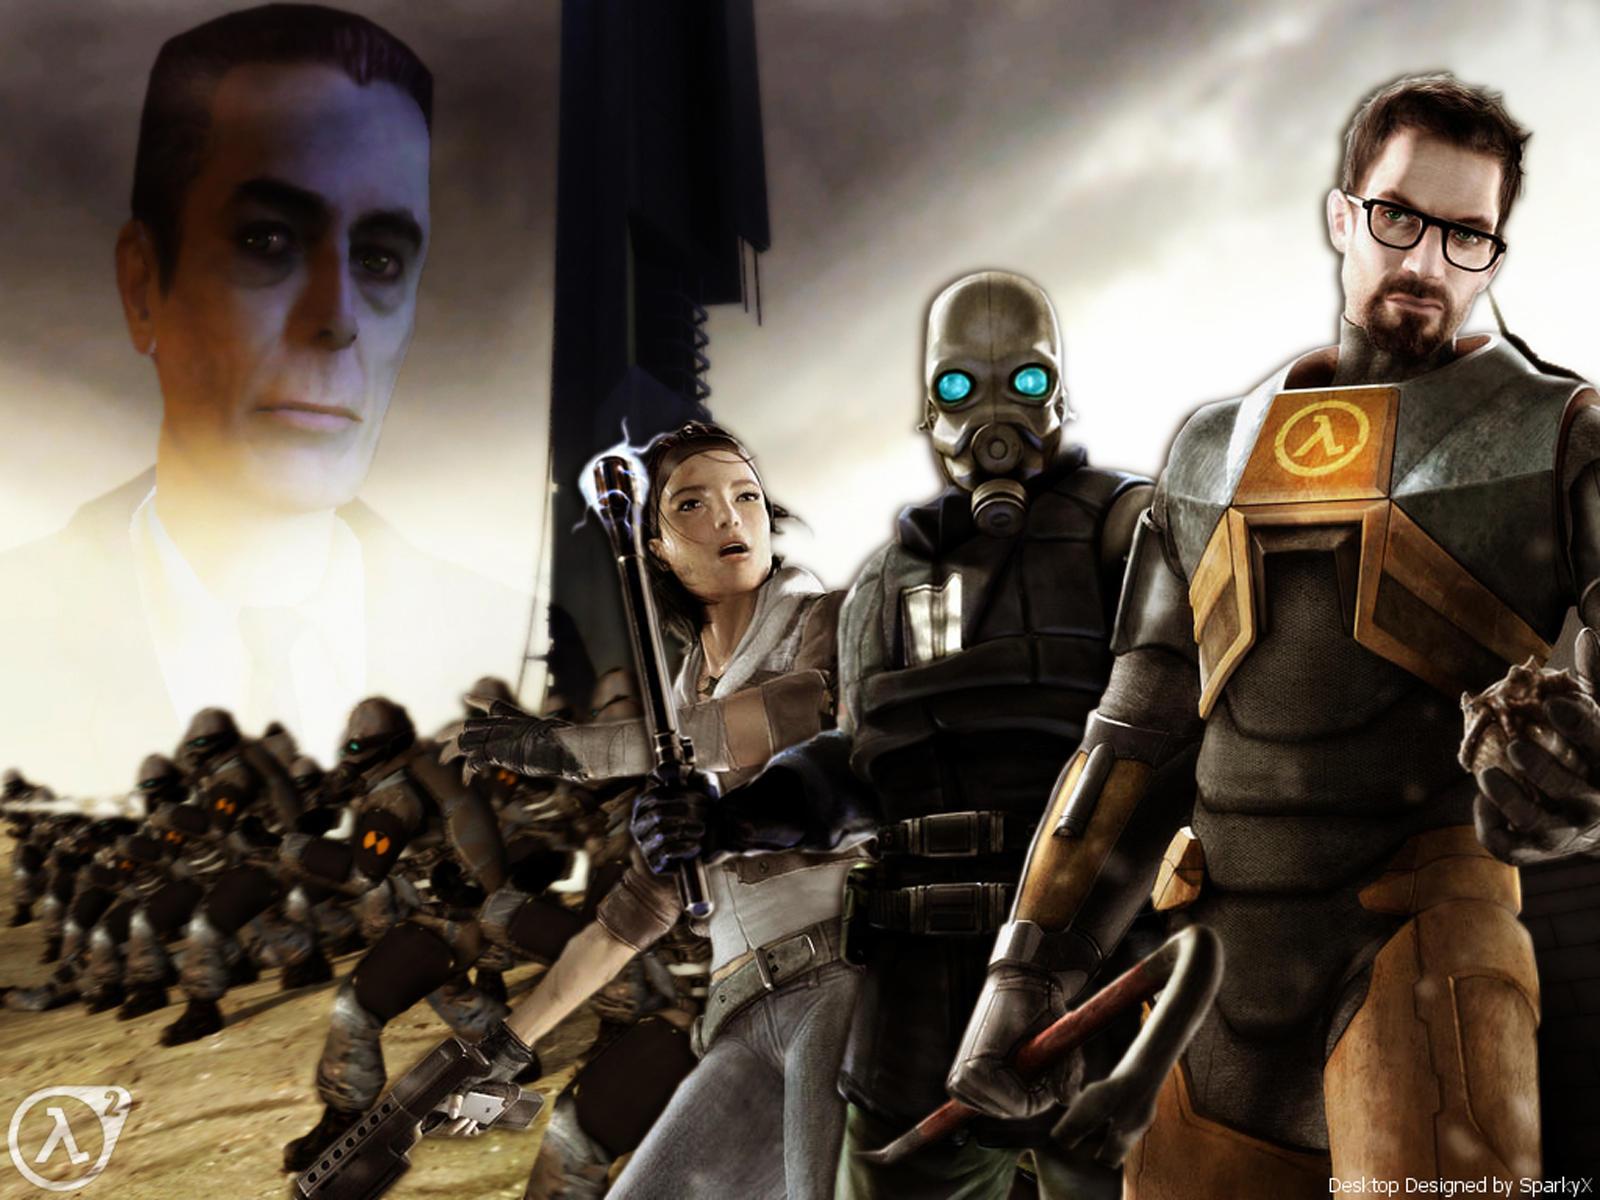 Half Life 2 Combine Wallpaper: Half-Life 2 Ultimate Wallpaper By SparkyX On DeviantArt